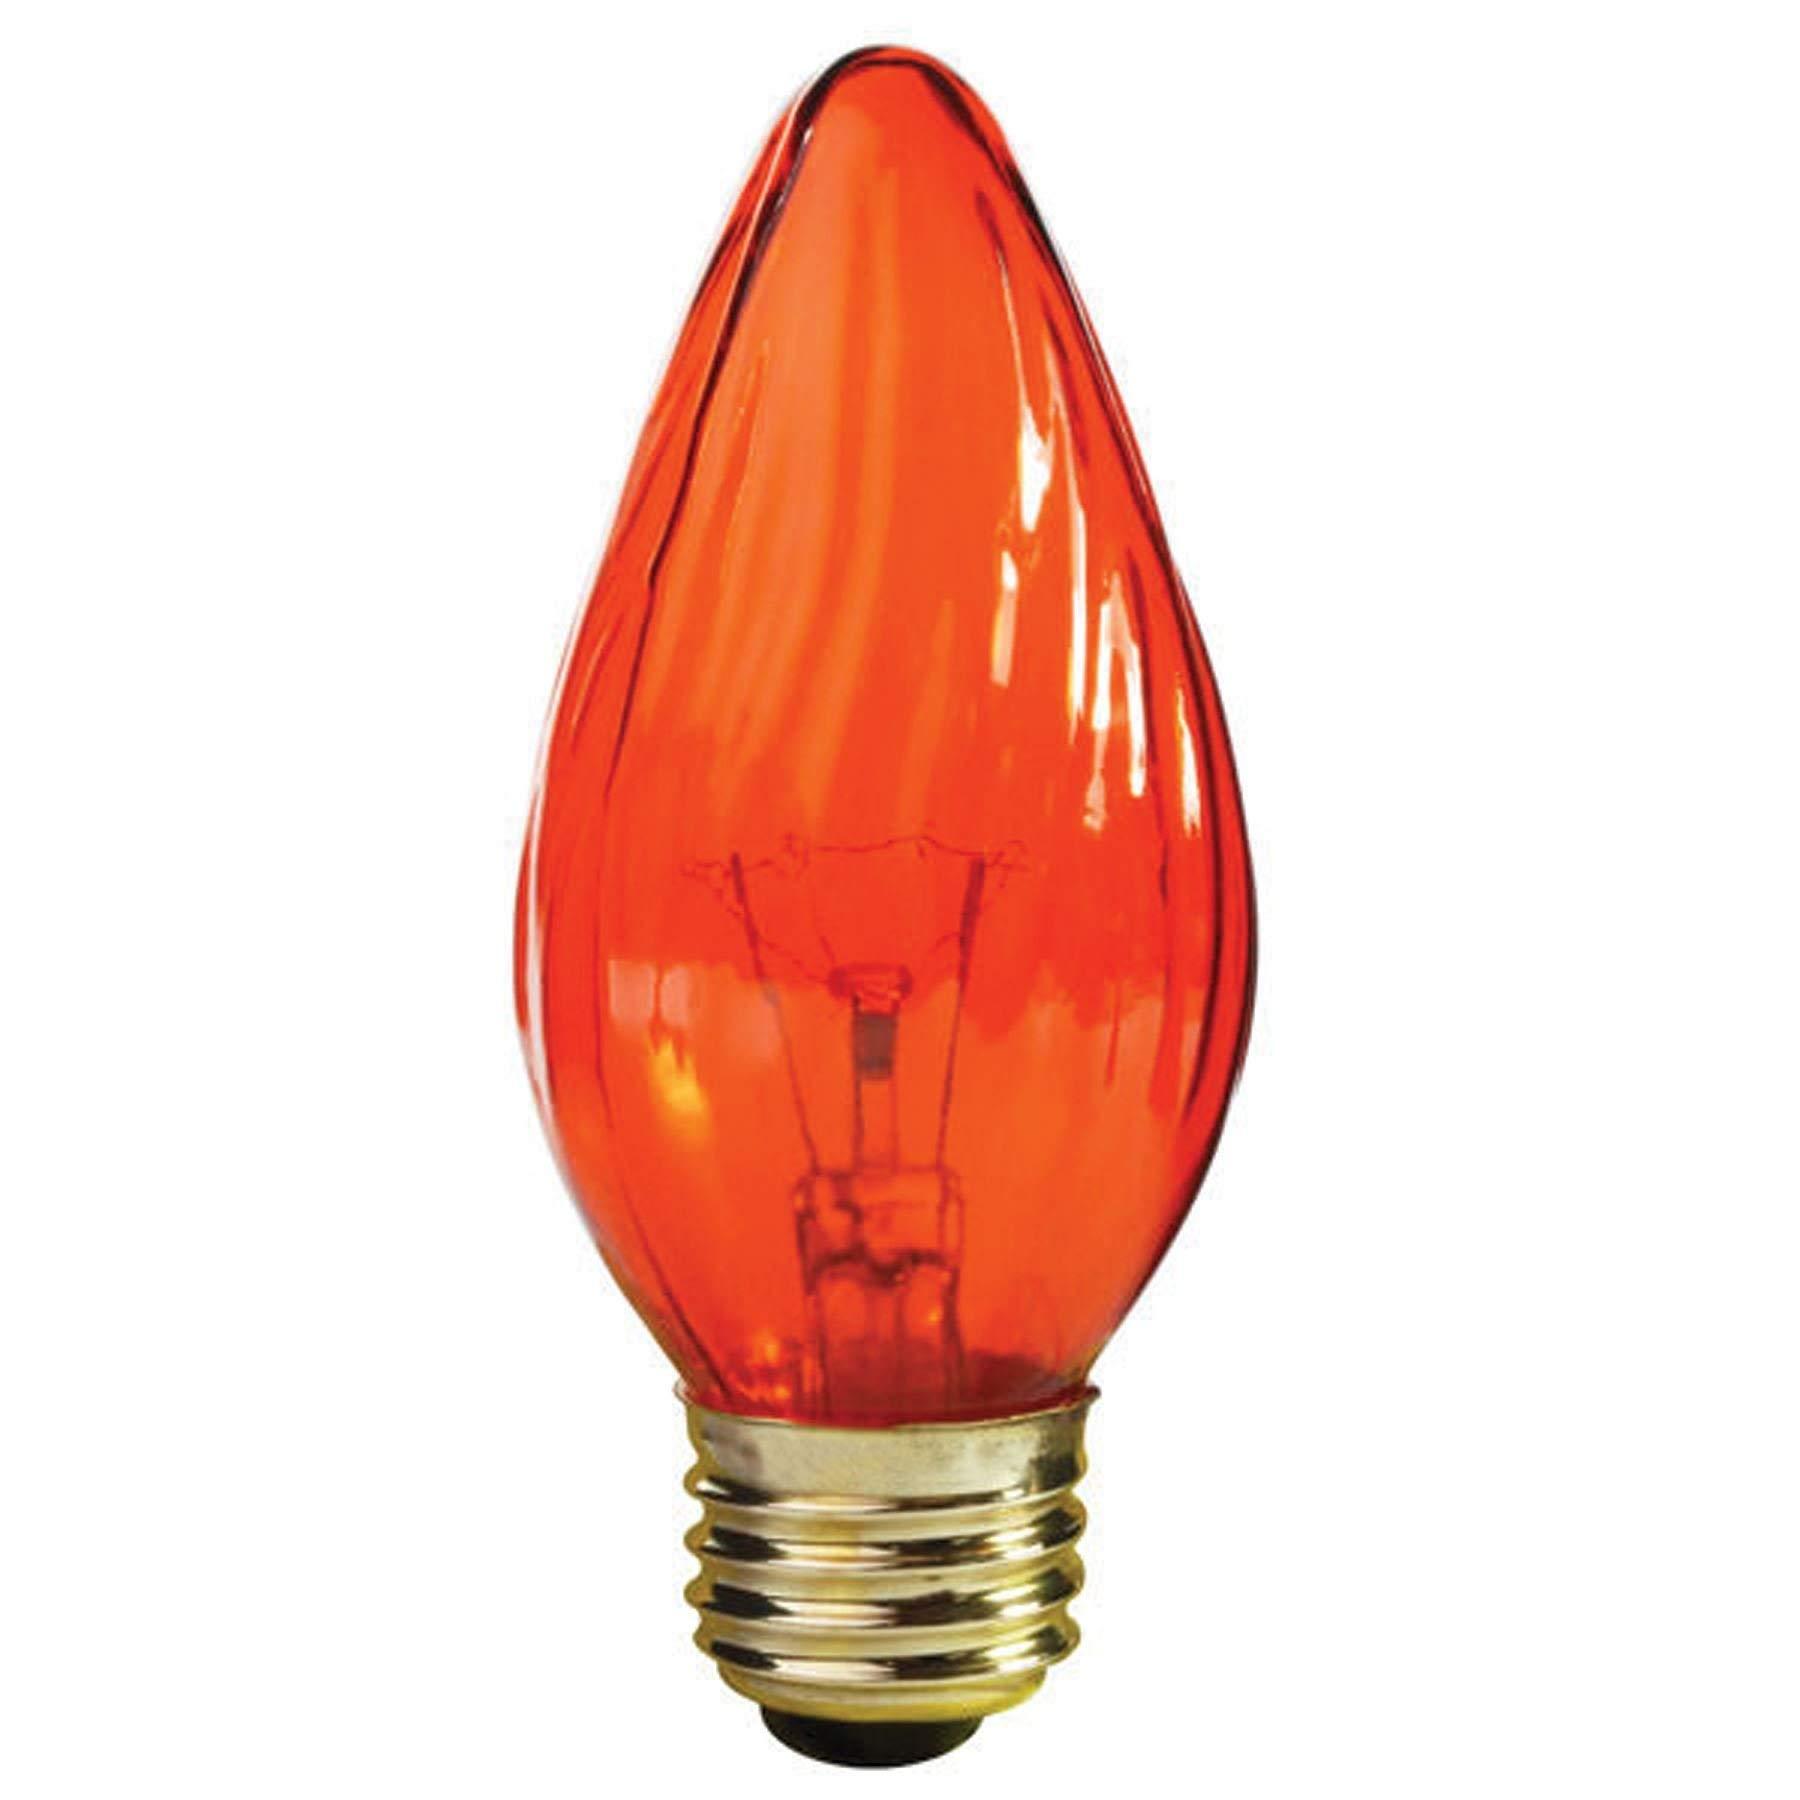 Satco 25F15/A Incandescent Decorative Light, 25W E26 F15, Amber Bulb [Pack of 24]